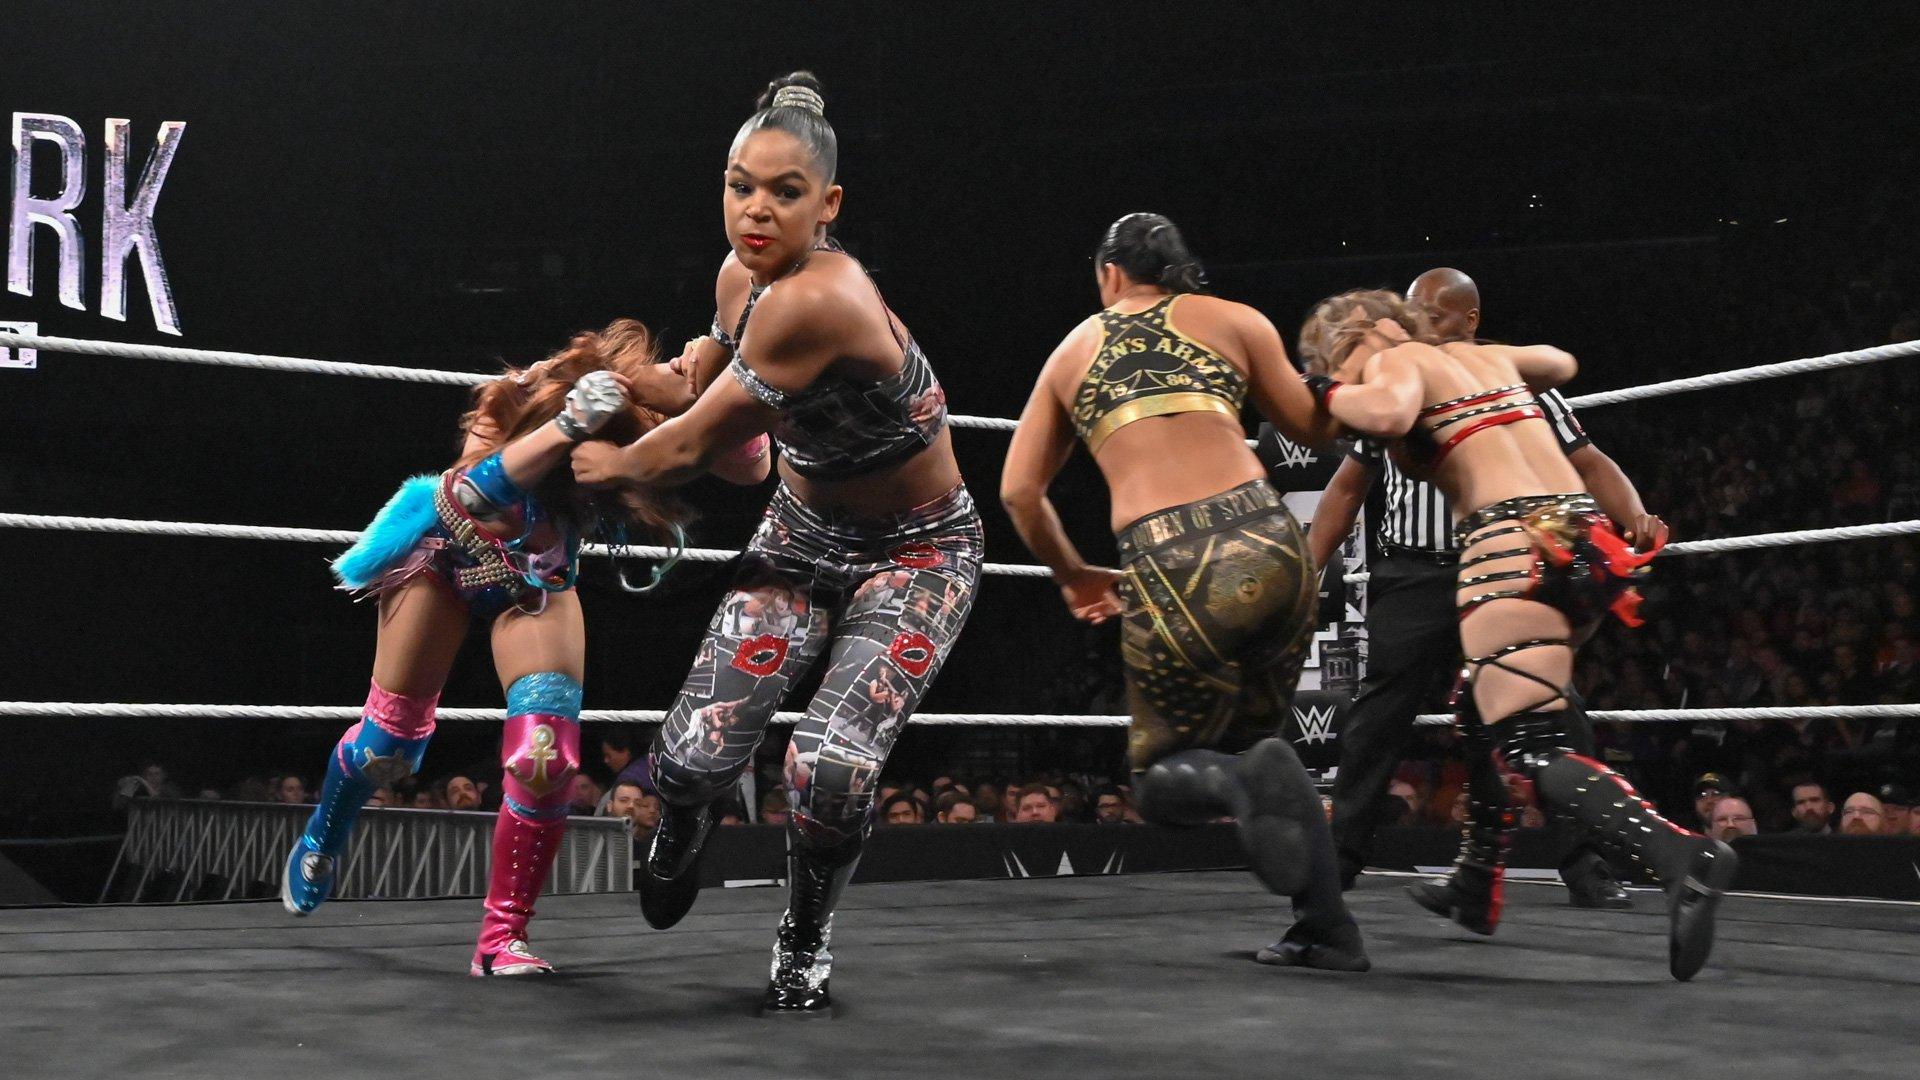 Kairi Sane vs. Io Shirai vs. Shayna Baszler vs. Bianca Belair - NXT Women's Title Fatal 4-Way Match: photos